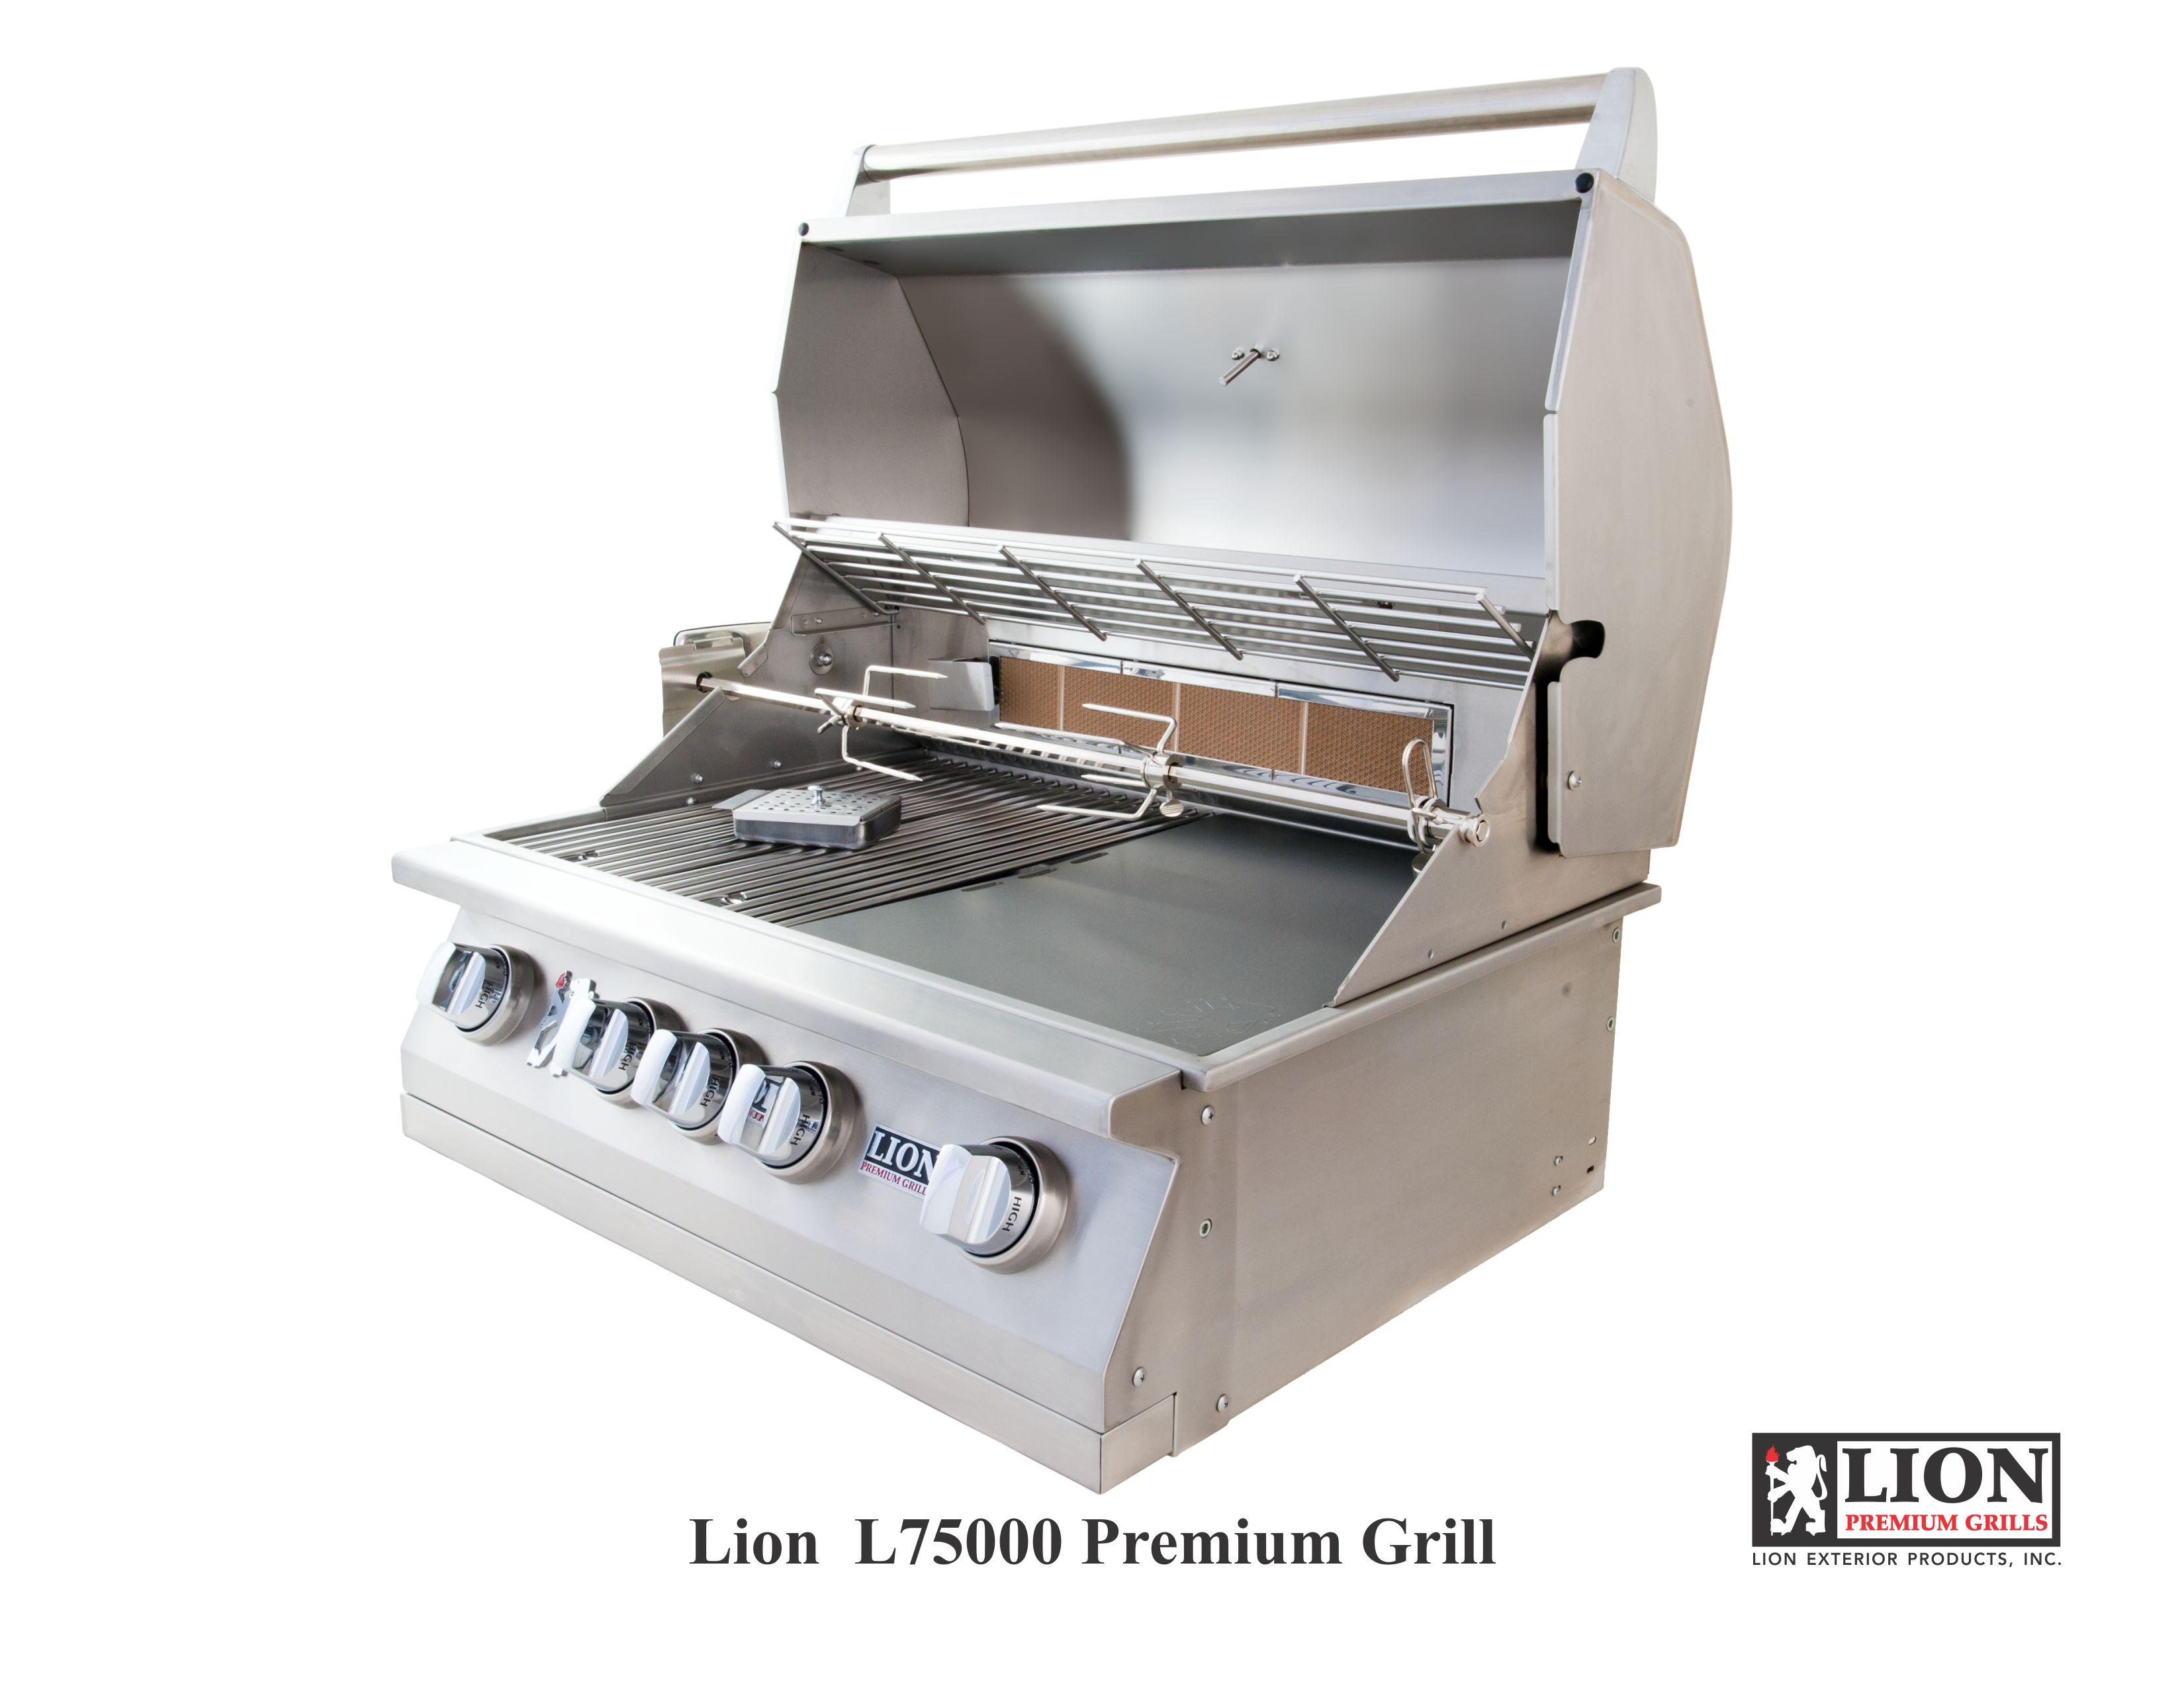 Lion Premium Grills L75000 32 Gas Grill